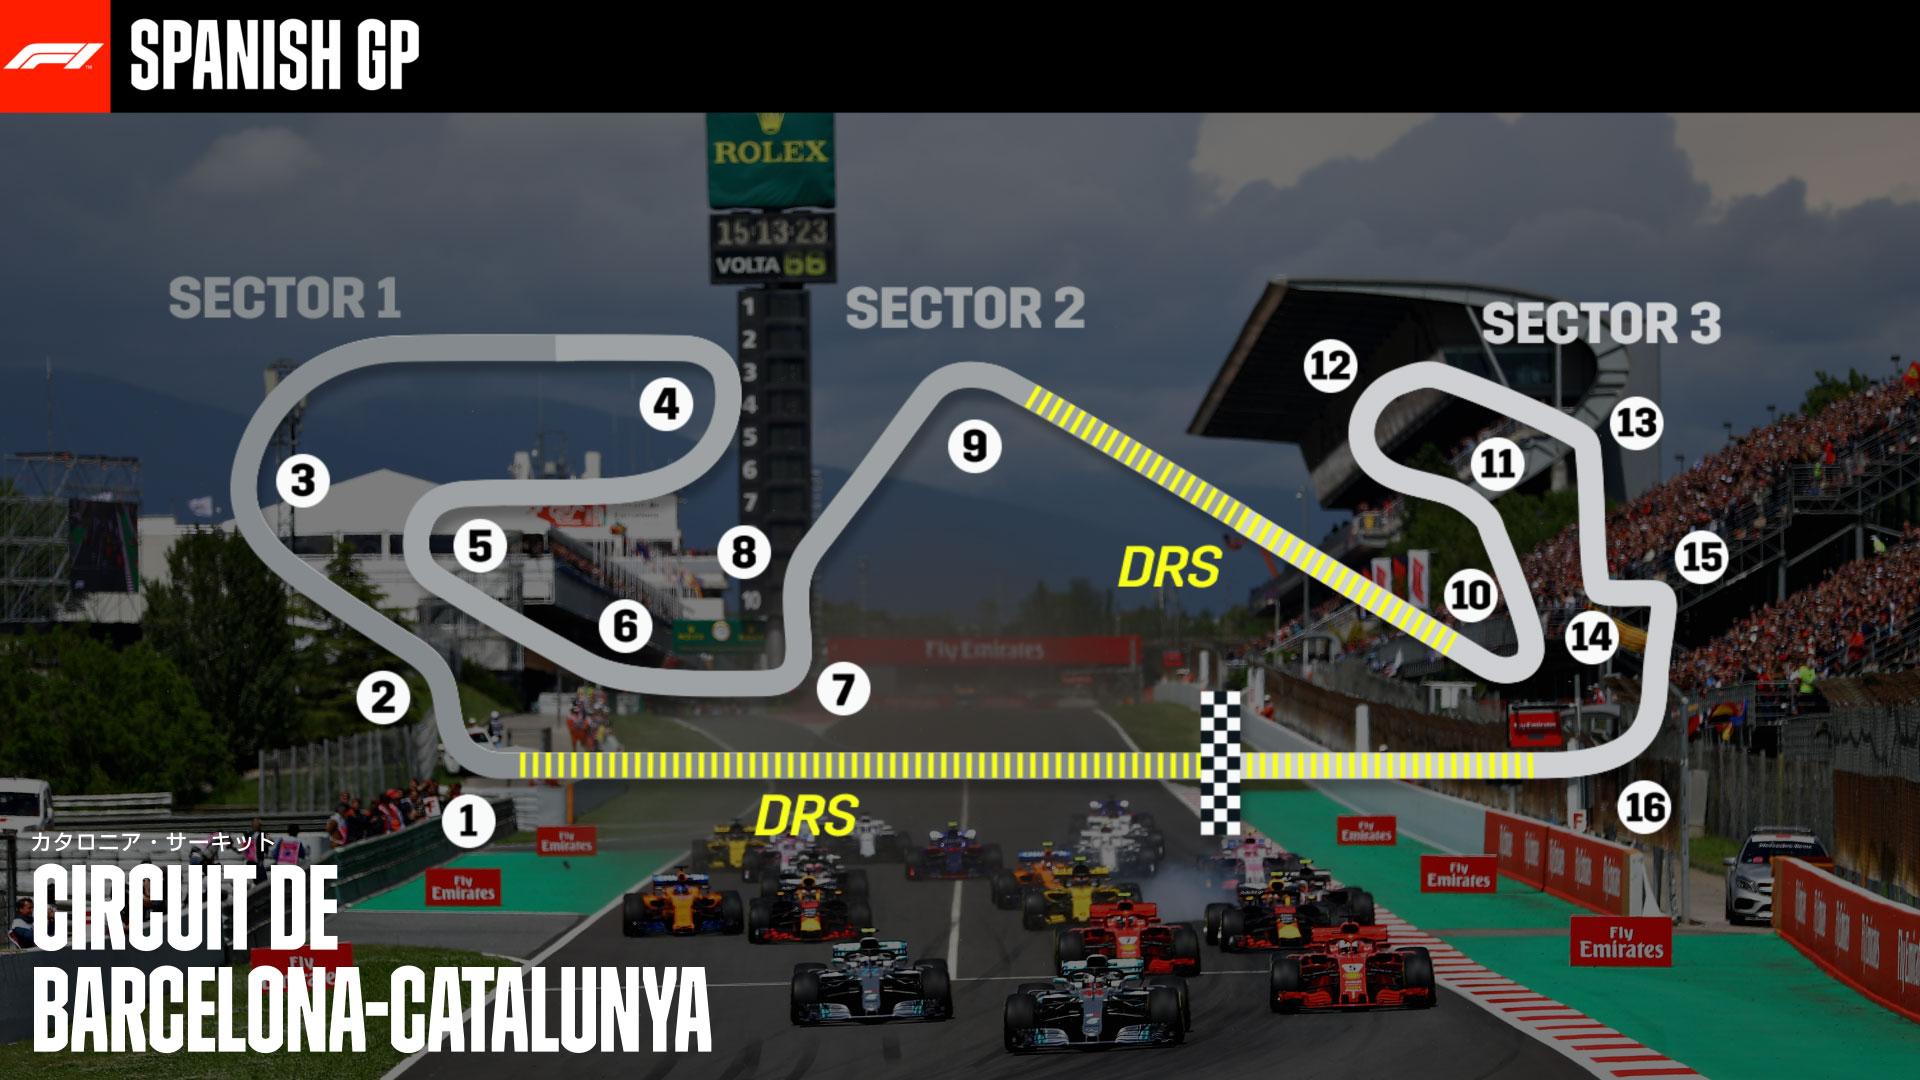 2020-07-27 Sapin Formula 1 F1 Course